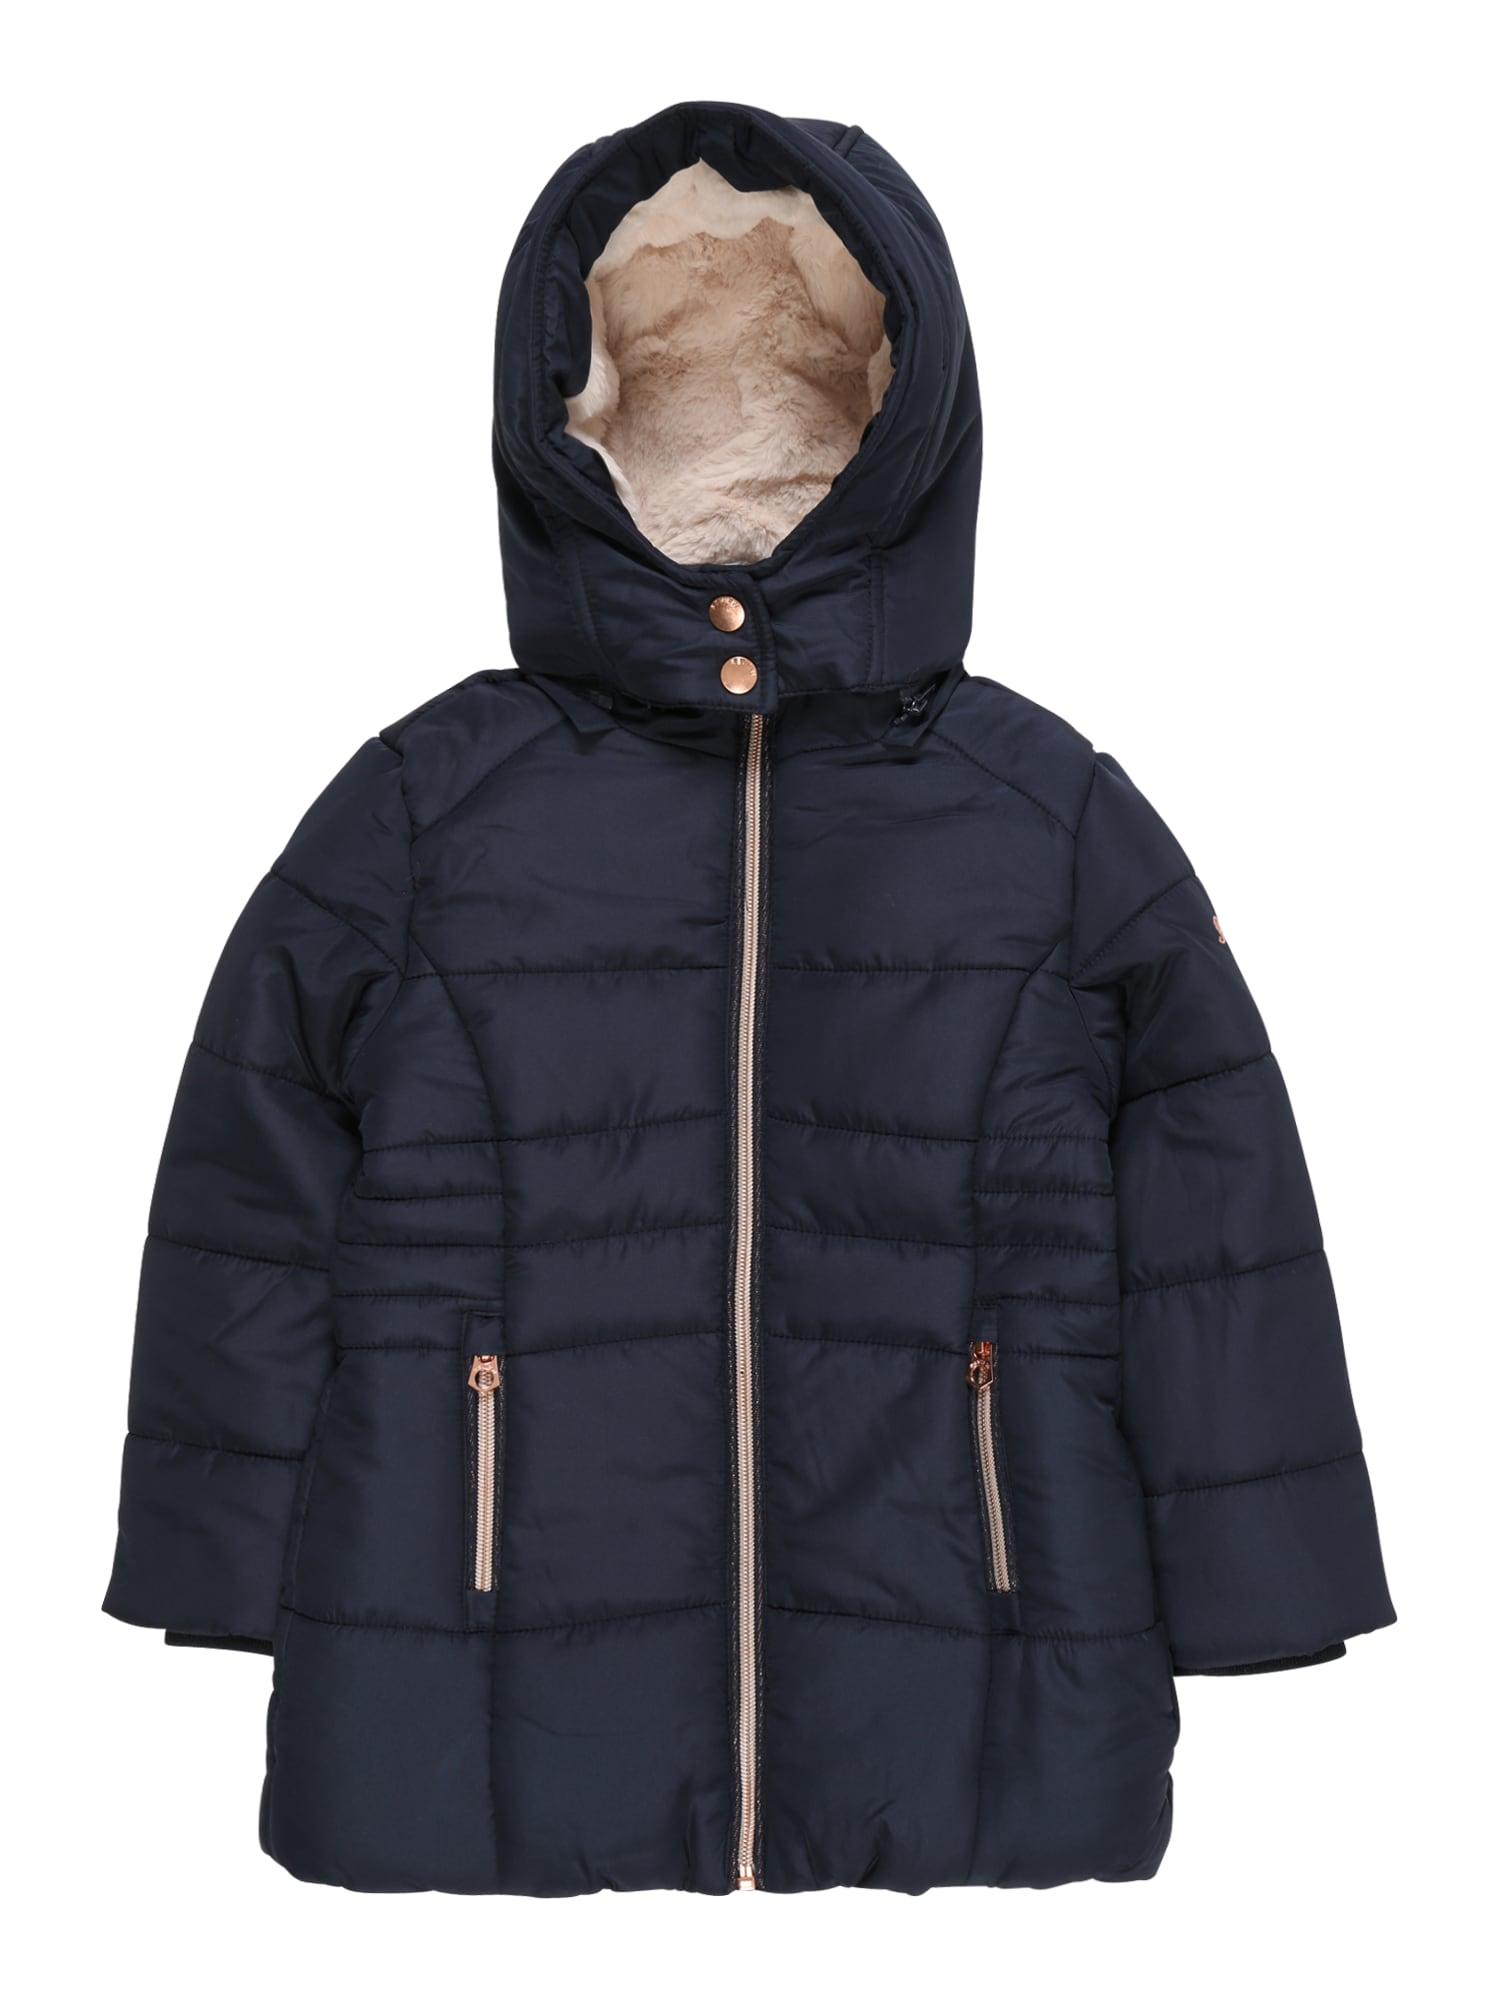 REVIEW FOR KIDS Žieminė striukė 'KG-19-J801' nakties mėlyna